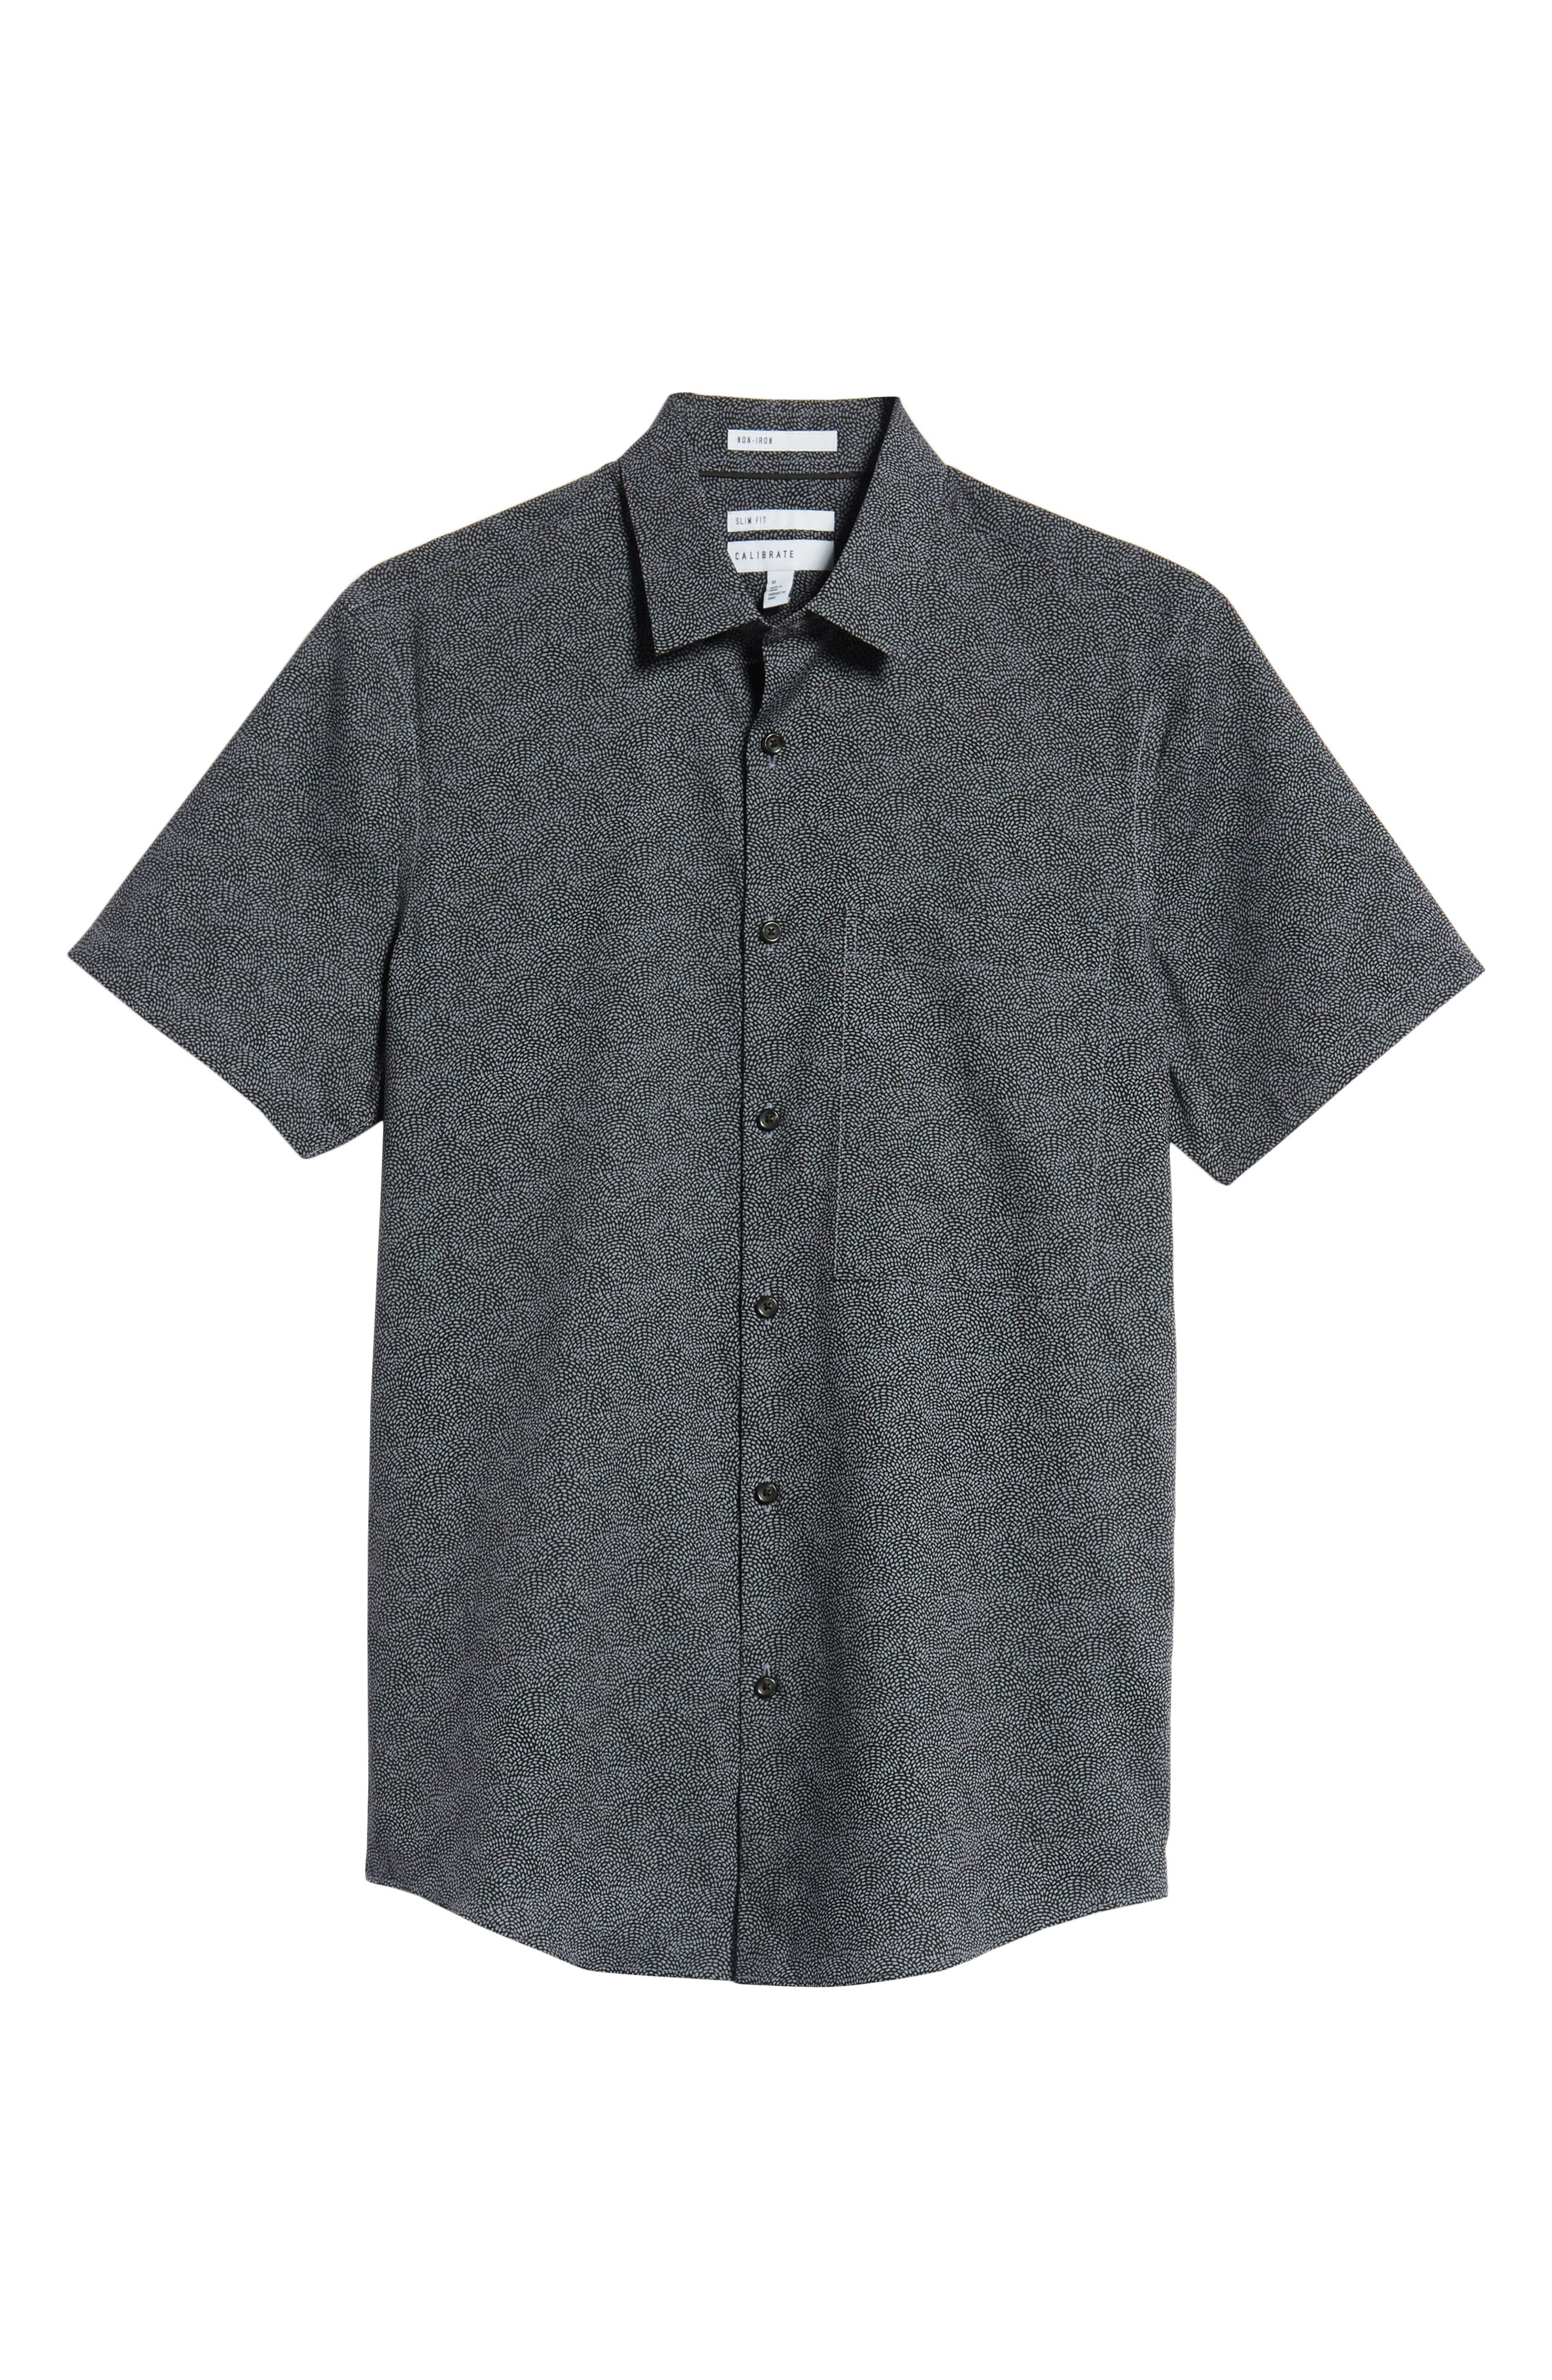 Slim Fit Print Non-Iron Sport Shirt,                             Alternate thumbnail 6, color,                             GREY FOLKSTONE BLACK DOT